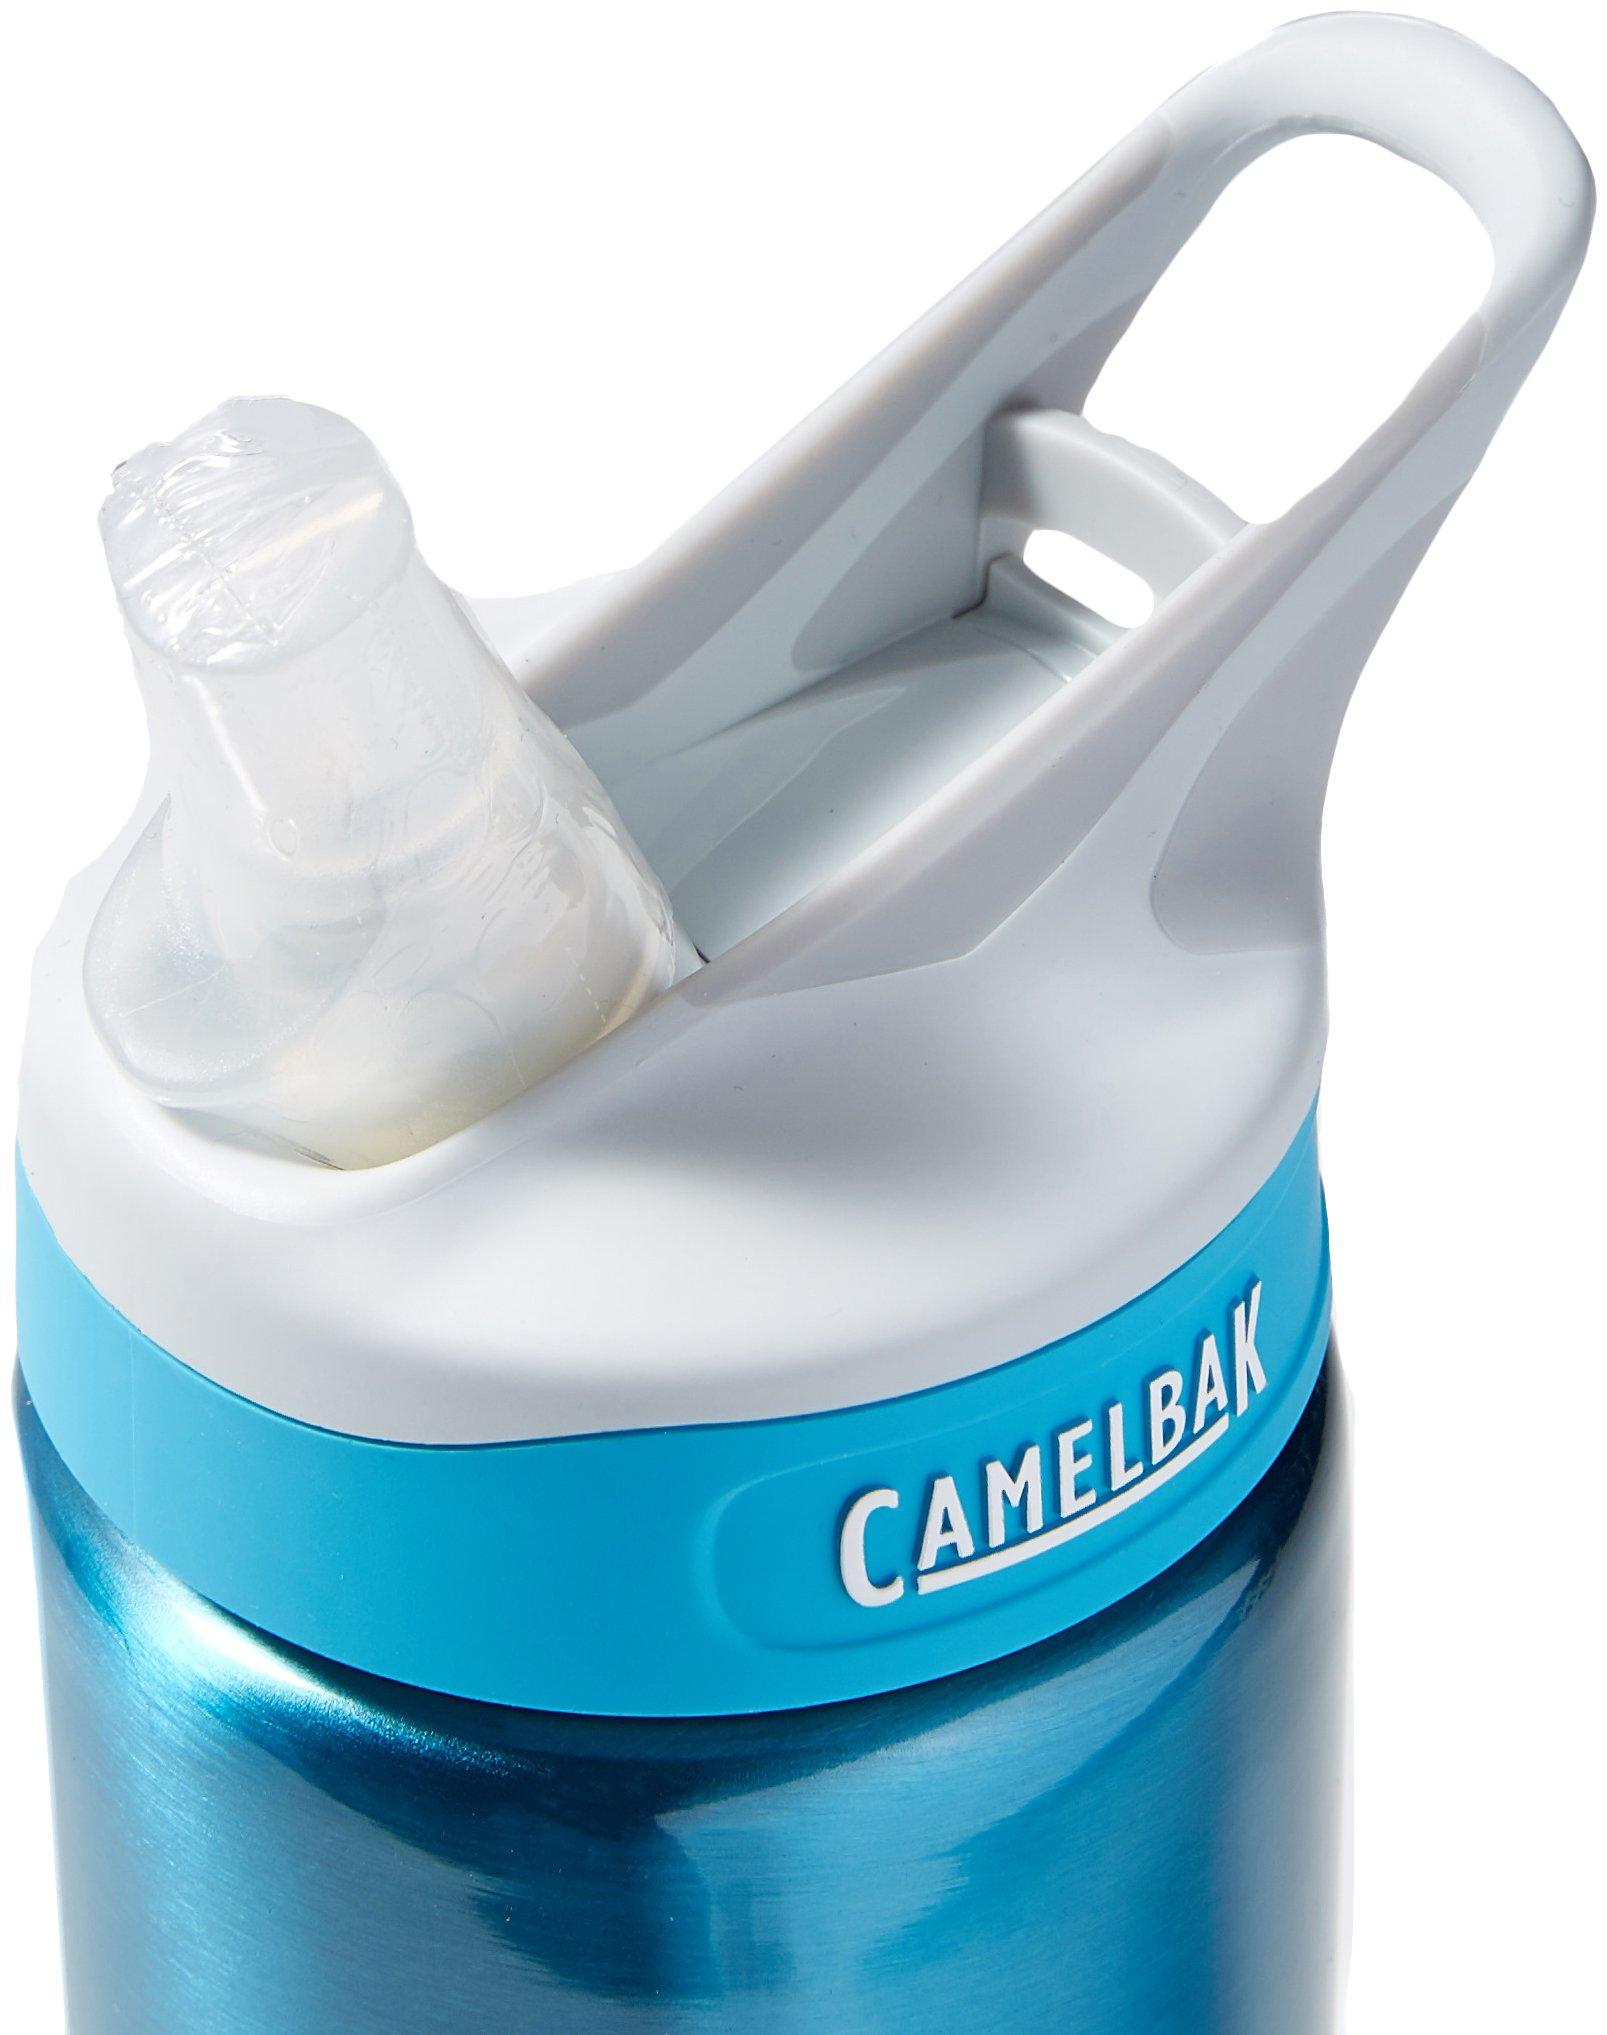 CamelBak eddy Vacuum Insulated Stainless, 20 oz, Rain